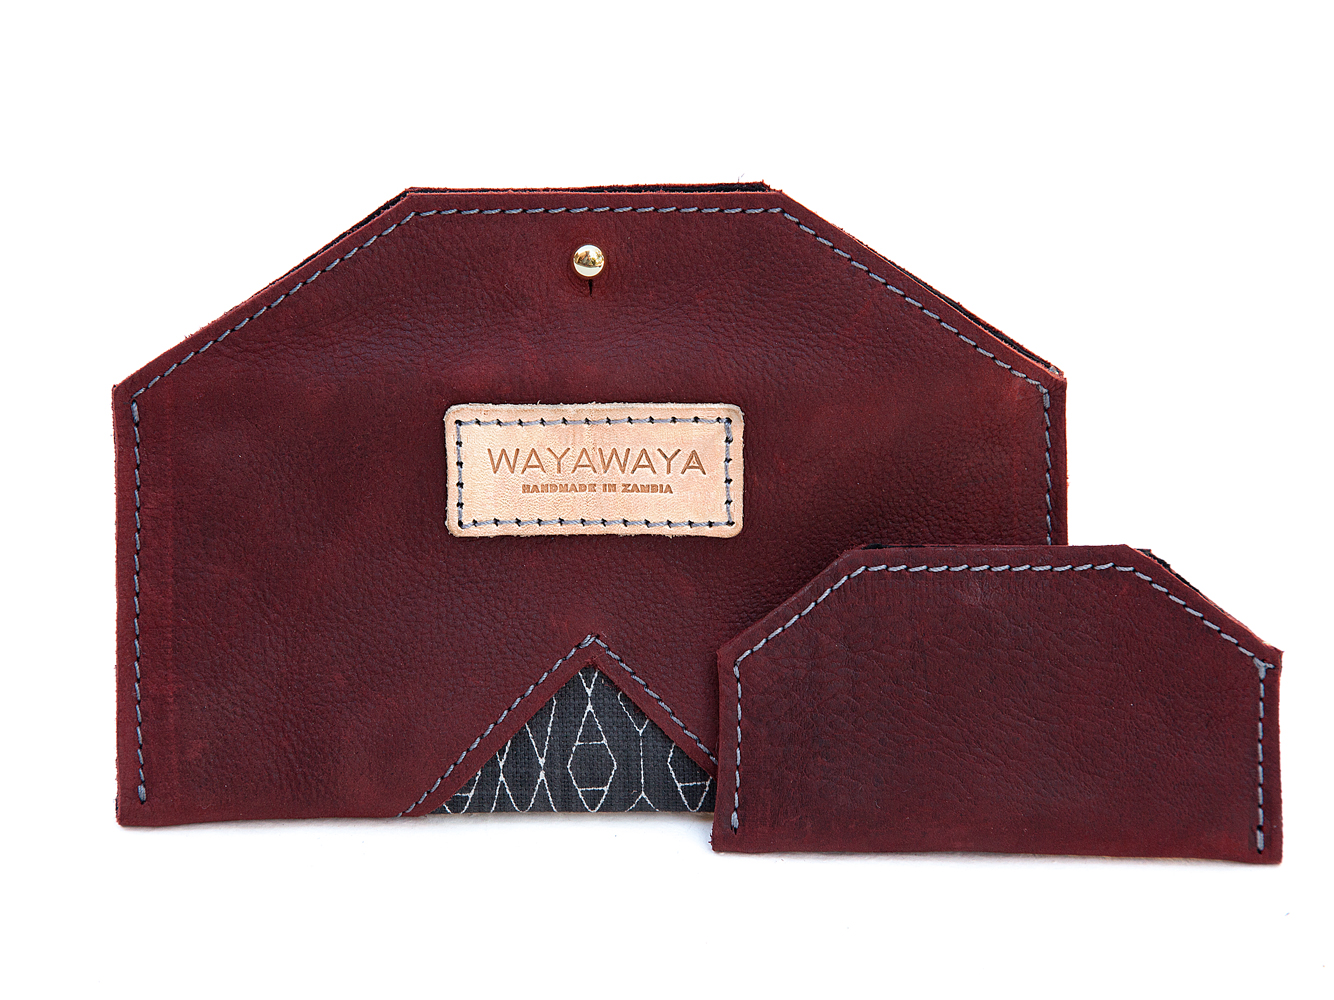 Alex-WAYAWAYA-Wallet-Maroon-04.jpg